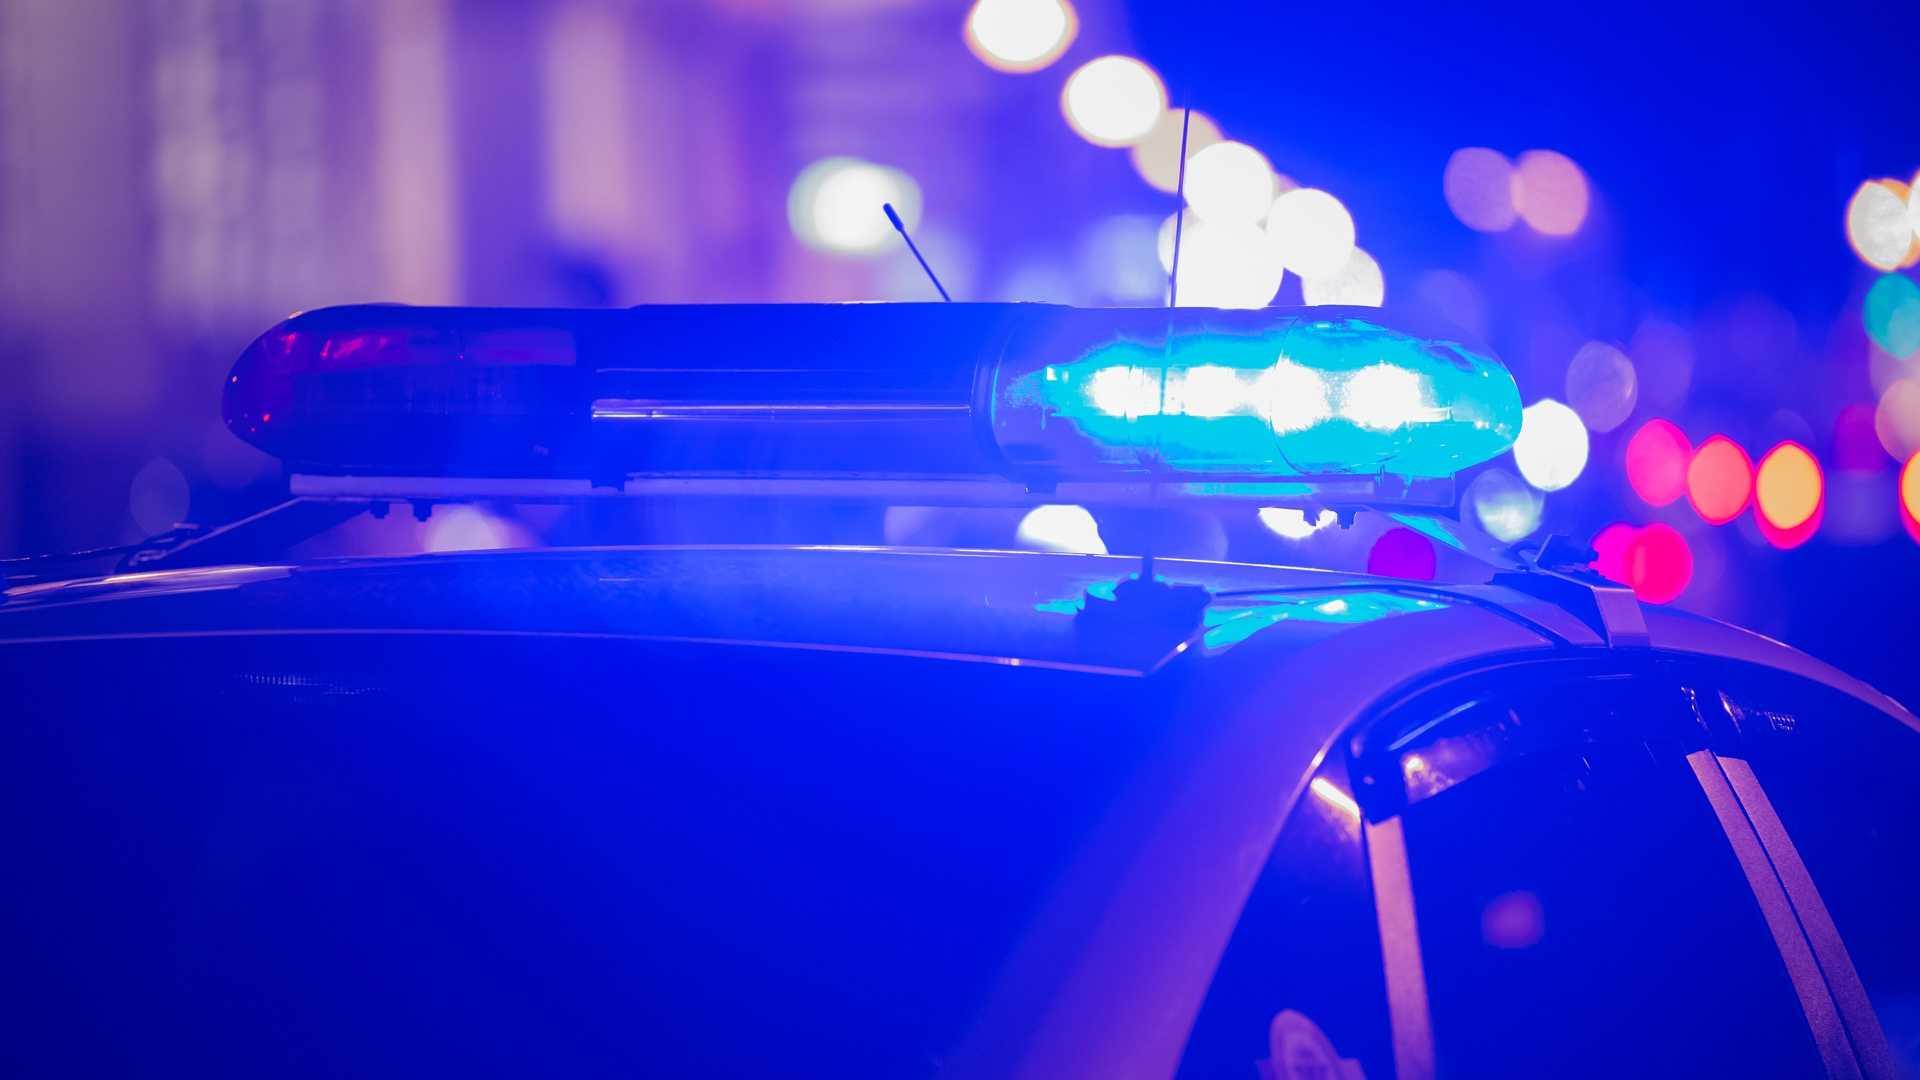 Police: Waterloo man left dog inside extremely hot vehicle